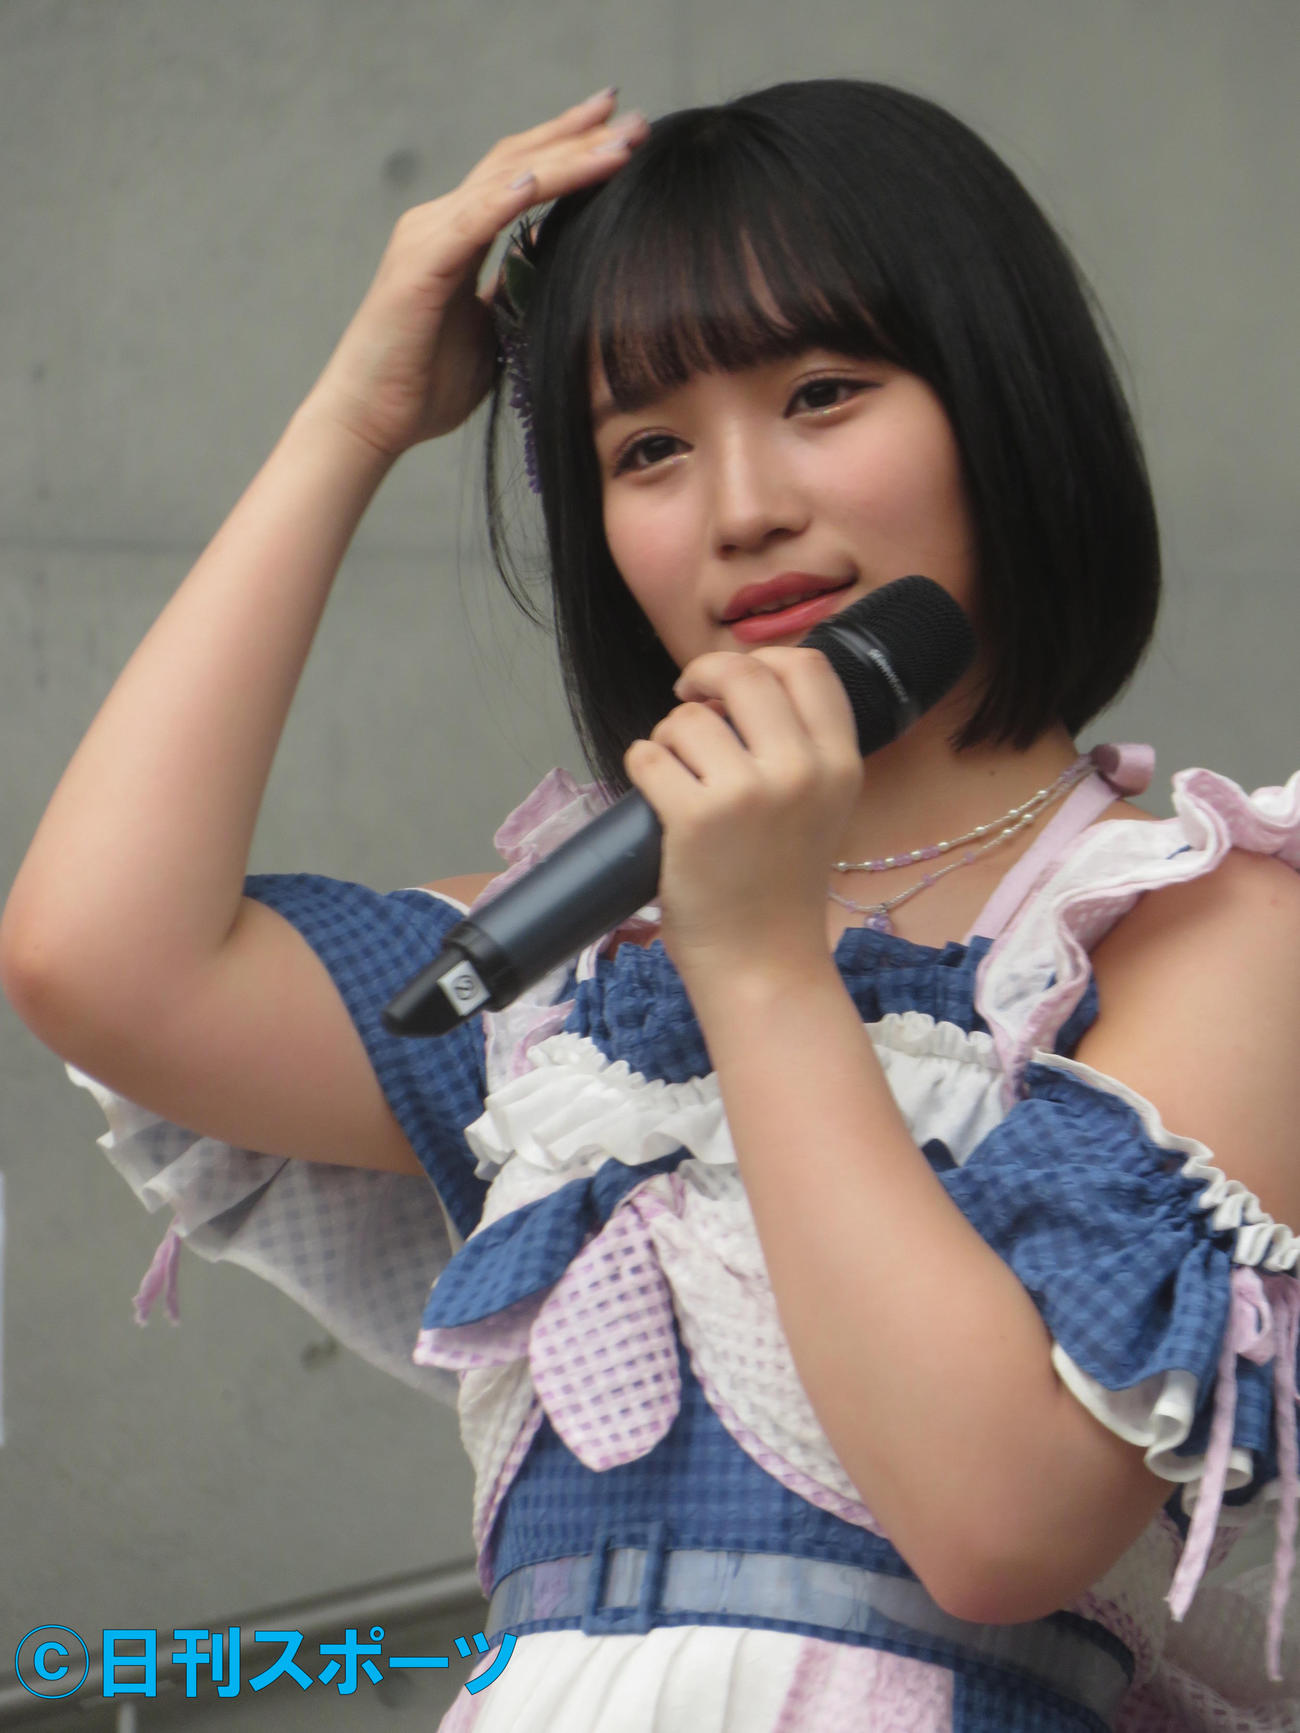 AKB48矢作萌夏が卒業「ミラモン」で涙の発表 , AKB48